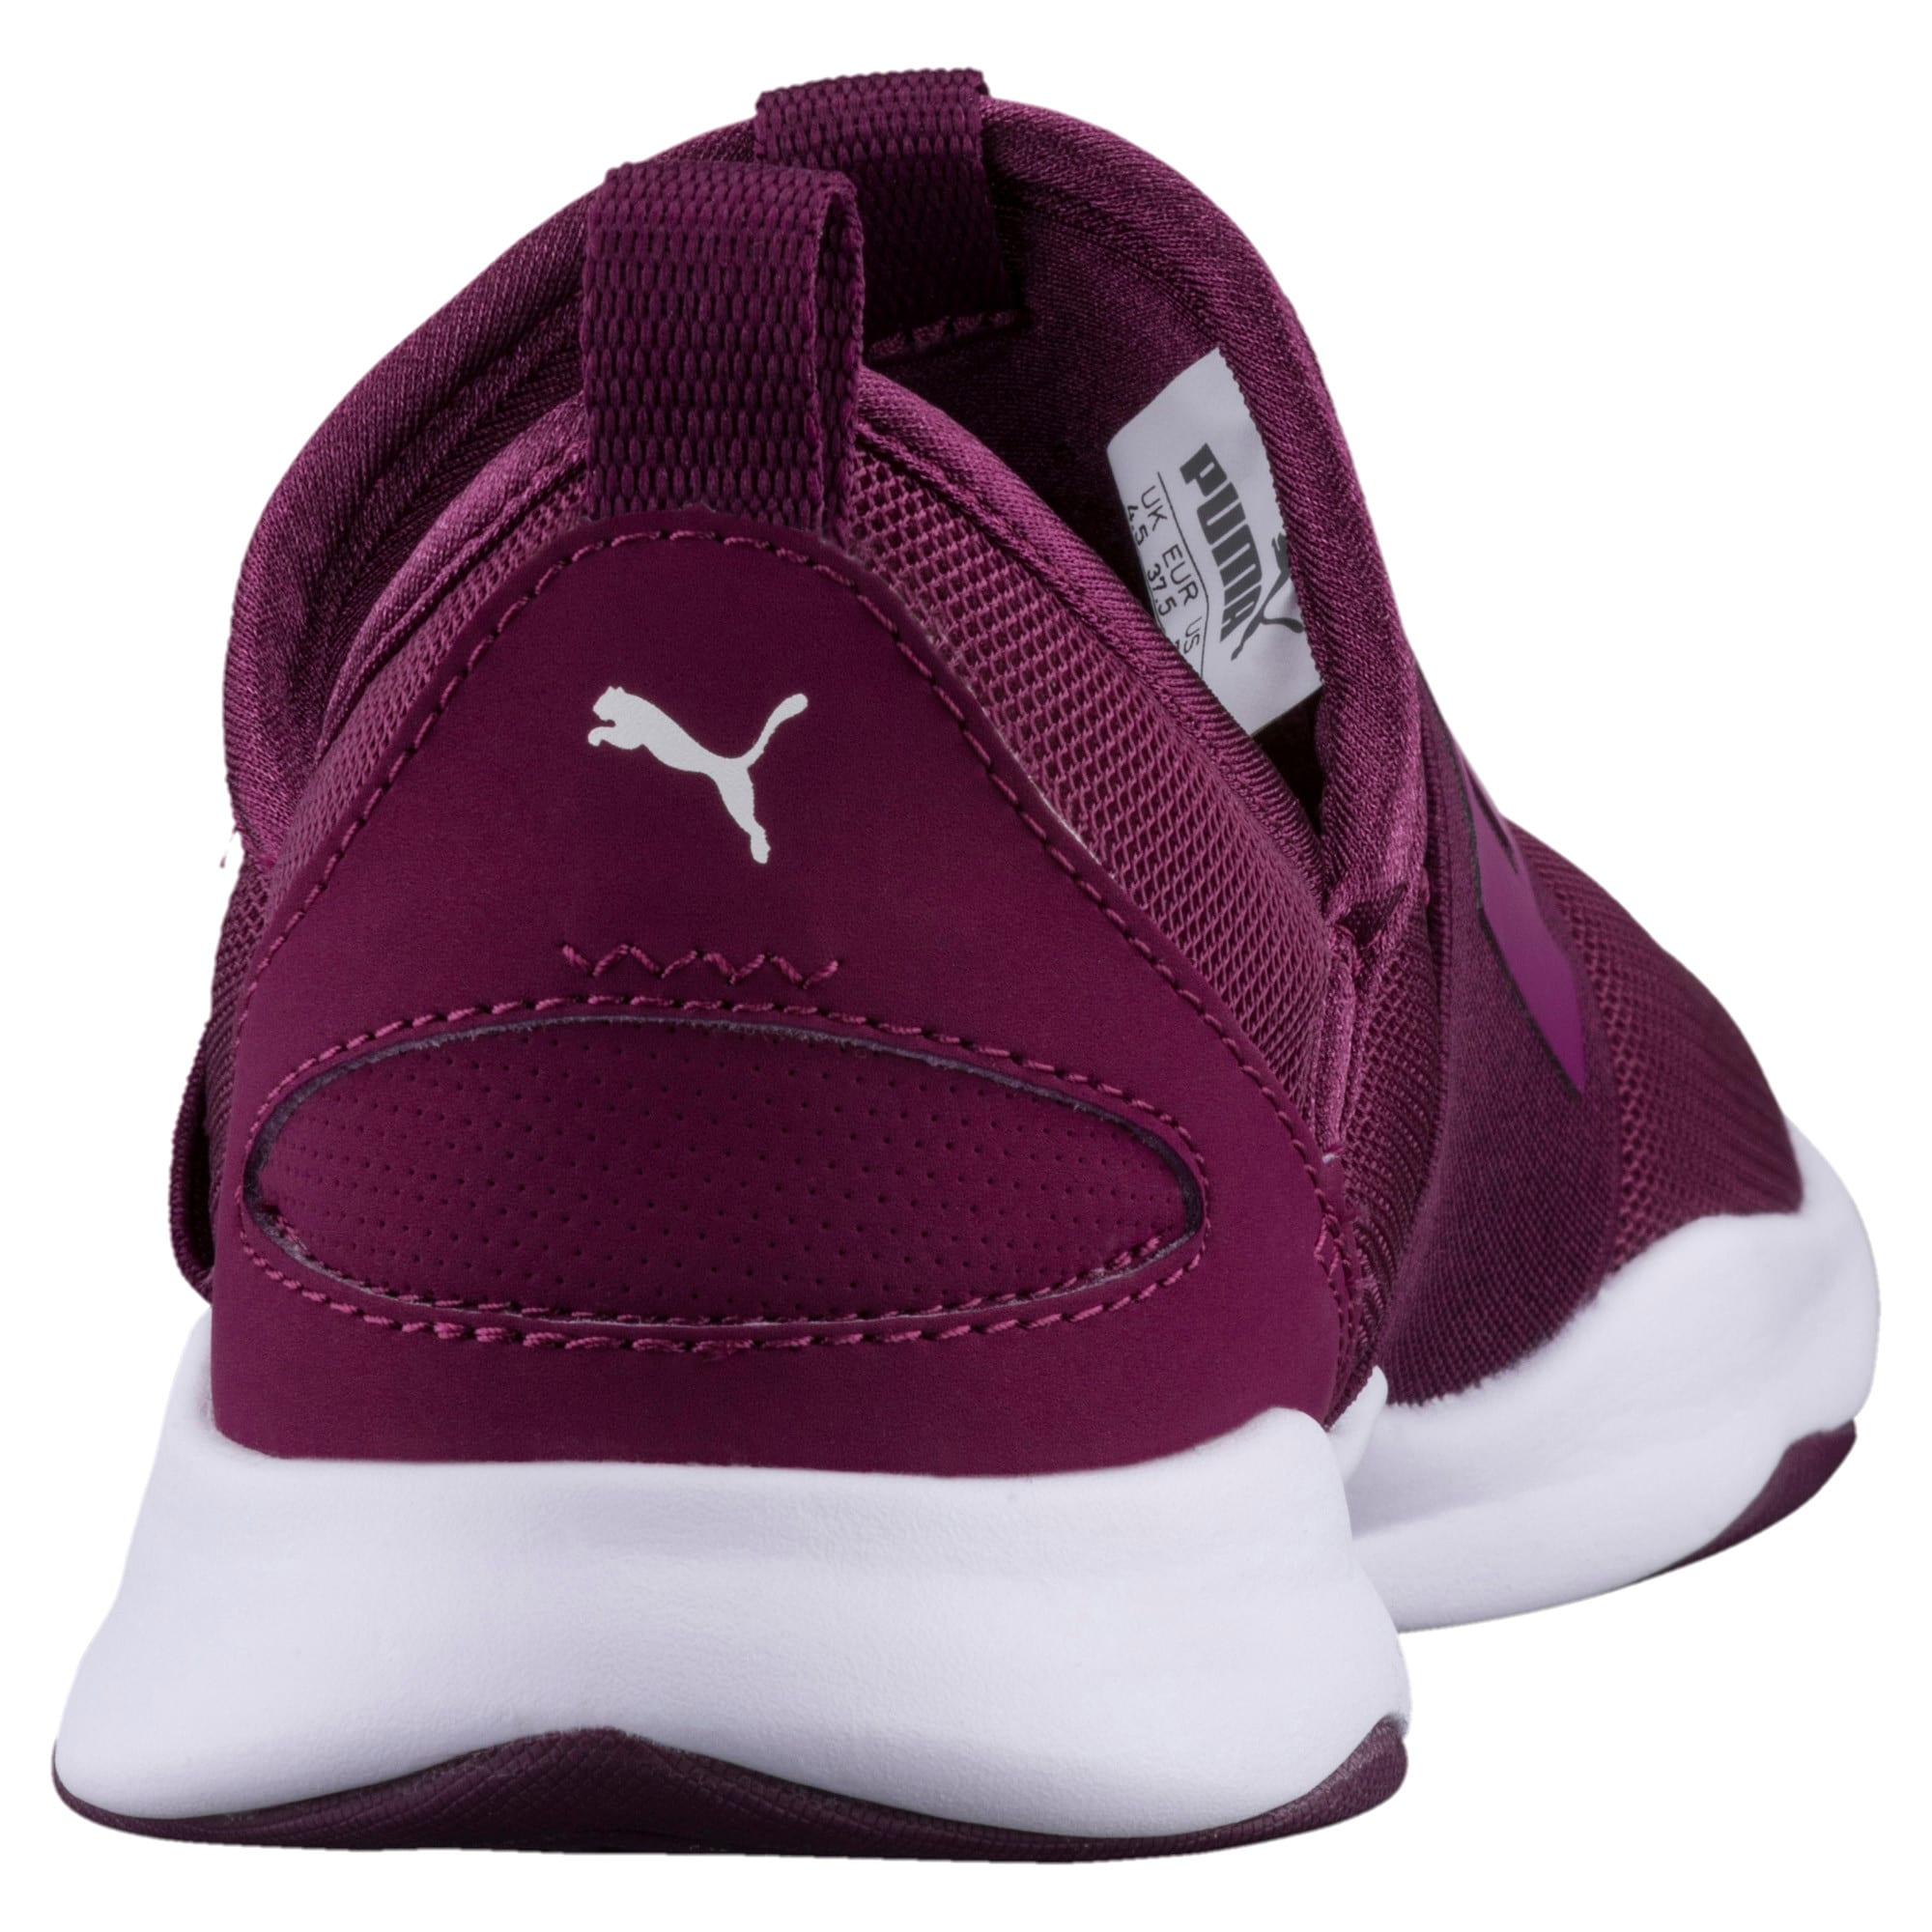 Thumbnail 4 of Dare Unisex Training Shoes, Dark Purple-Dark Purple, medium